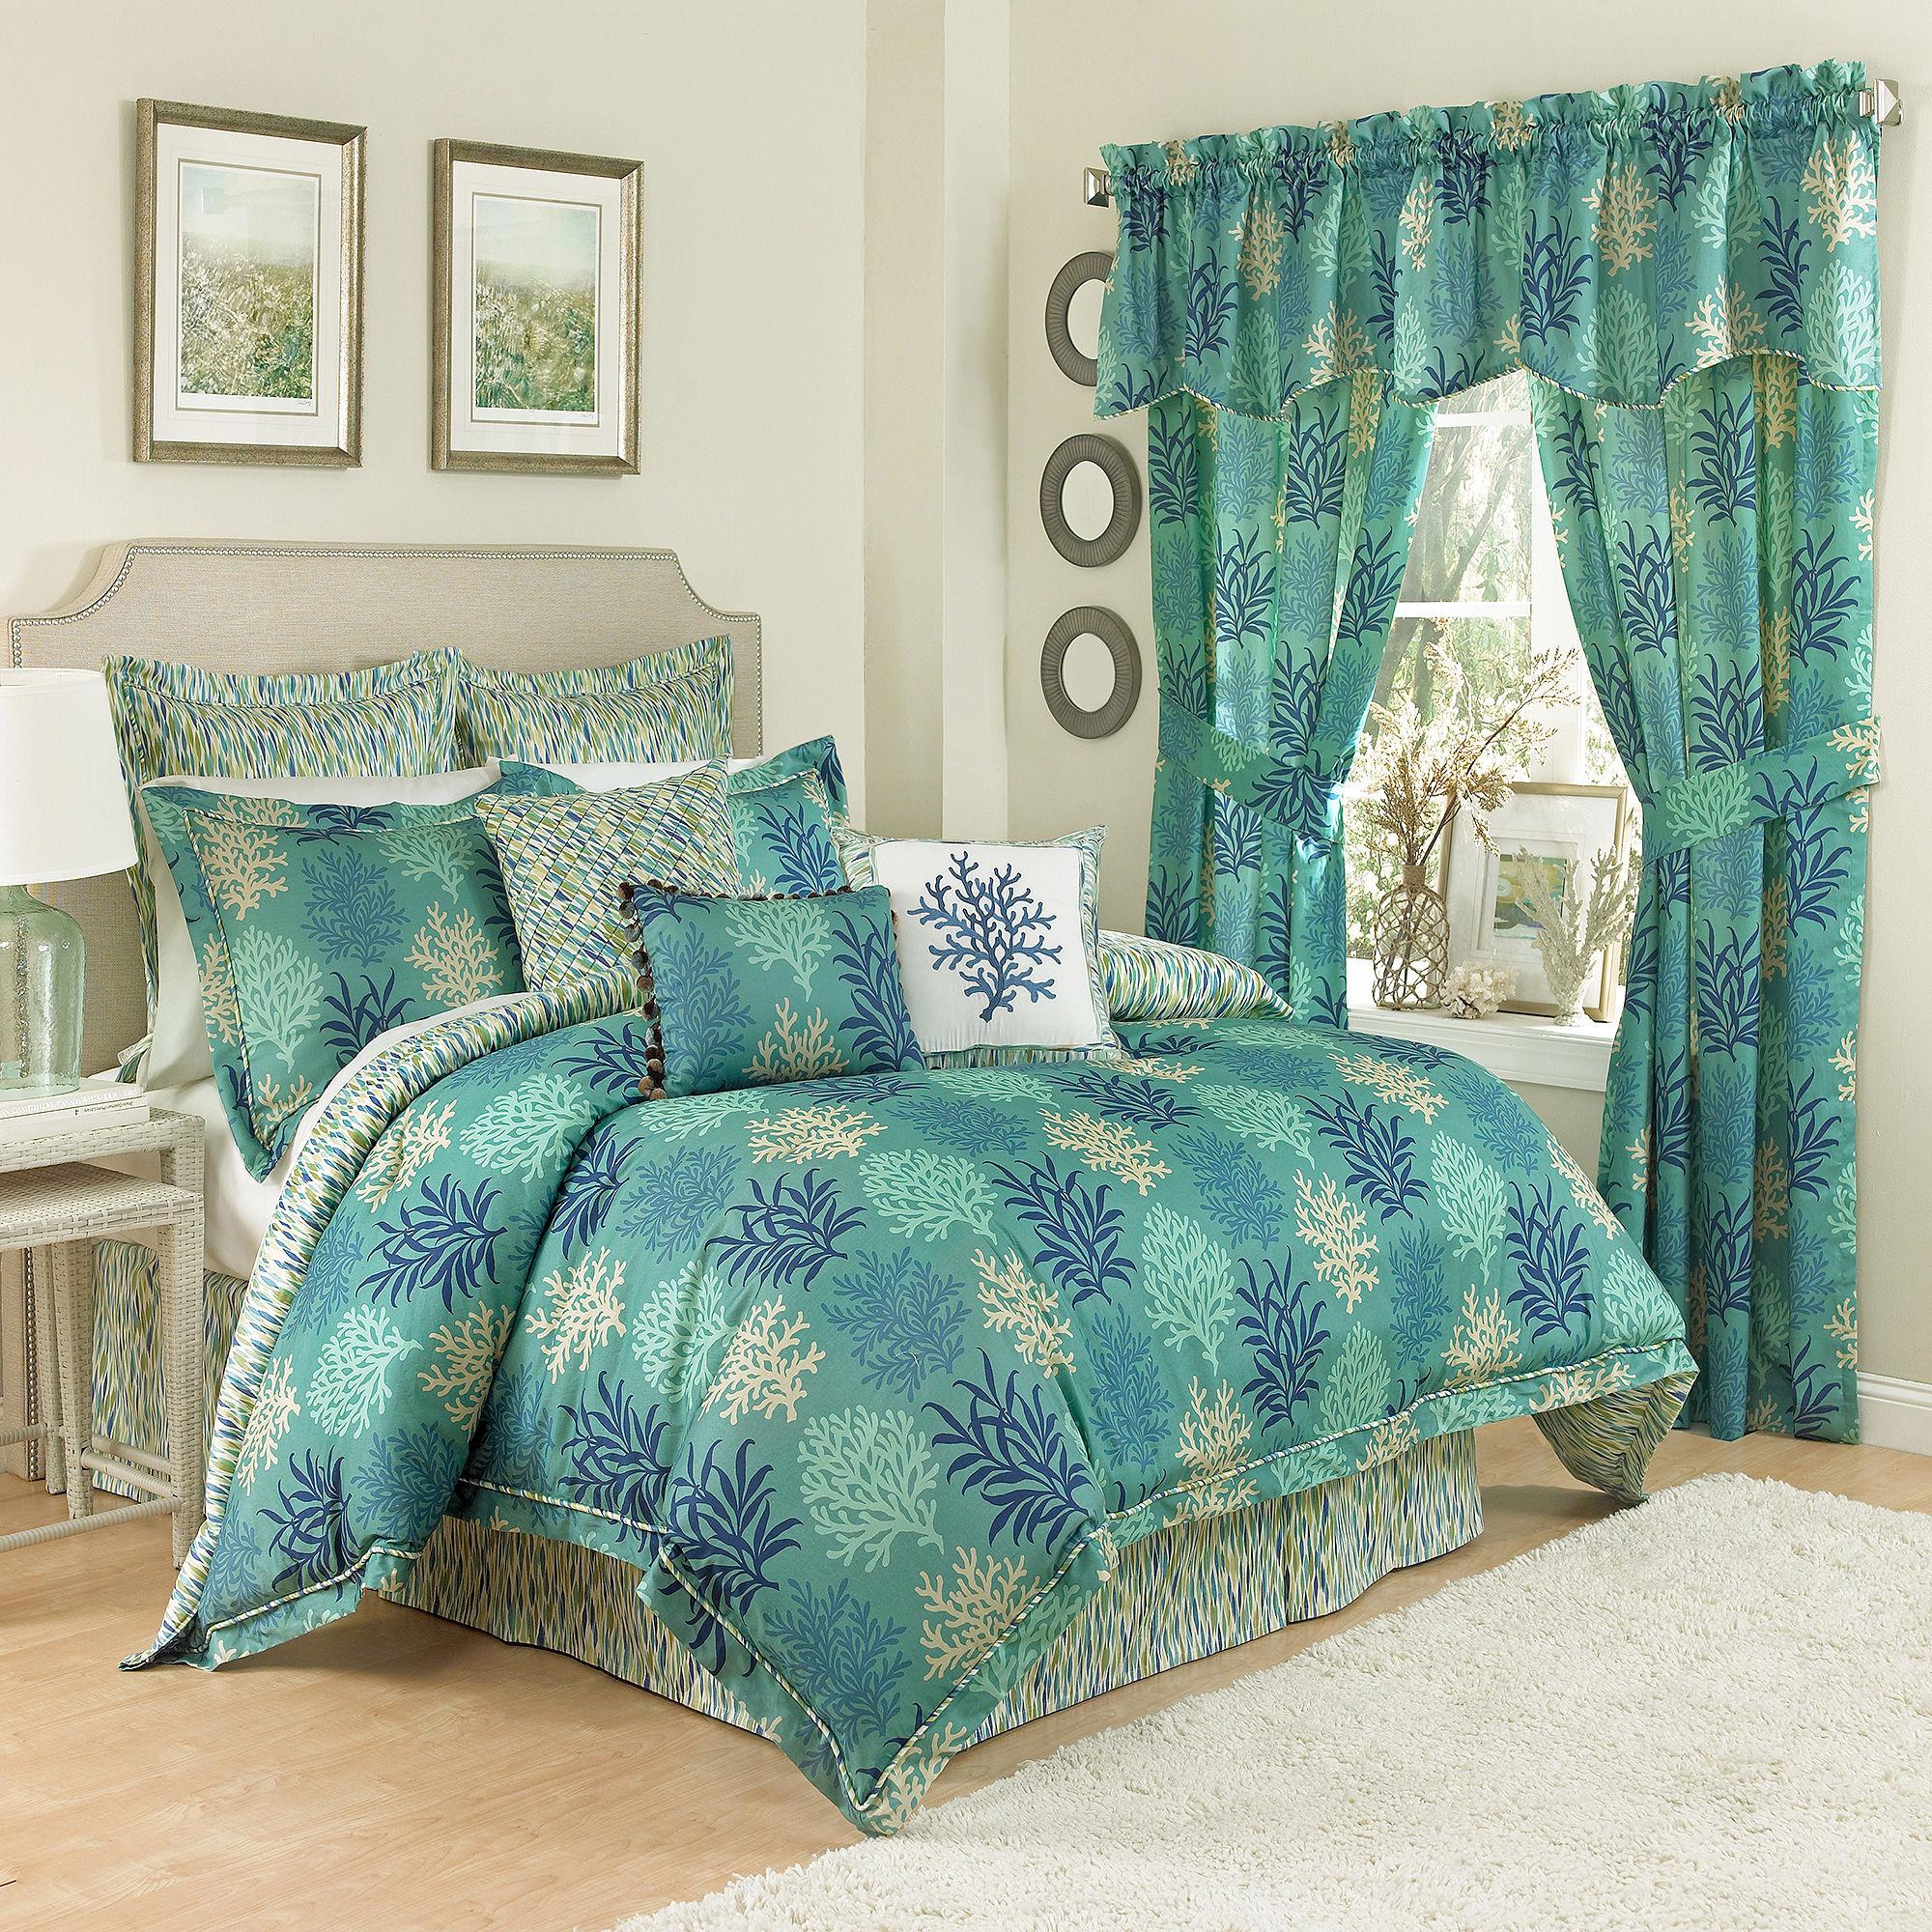 Waverly Marine Life 4-pc. Reversible Comforter Set